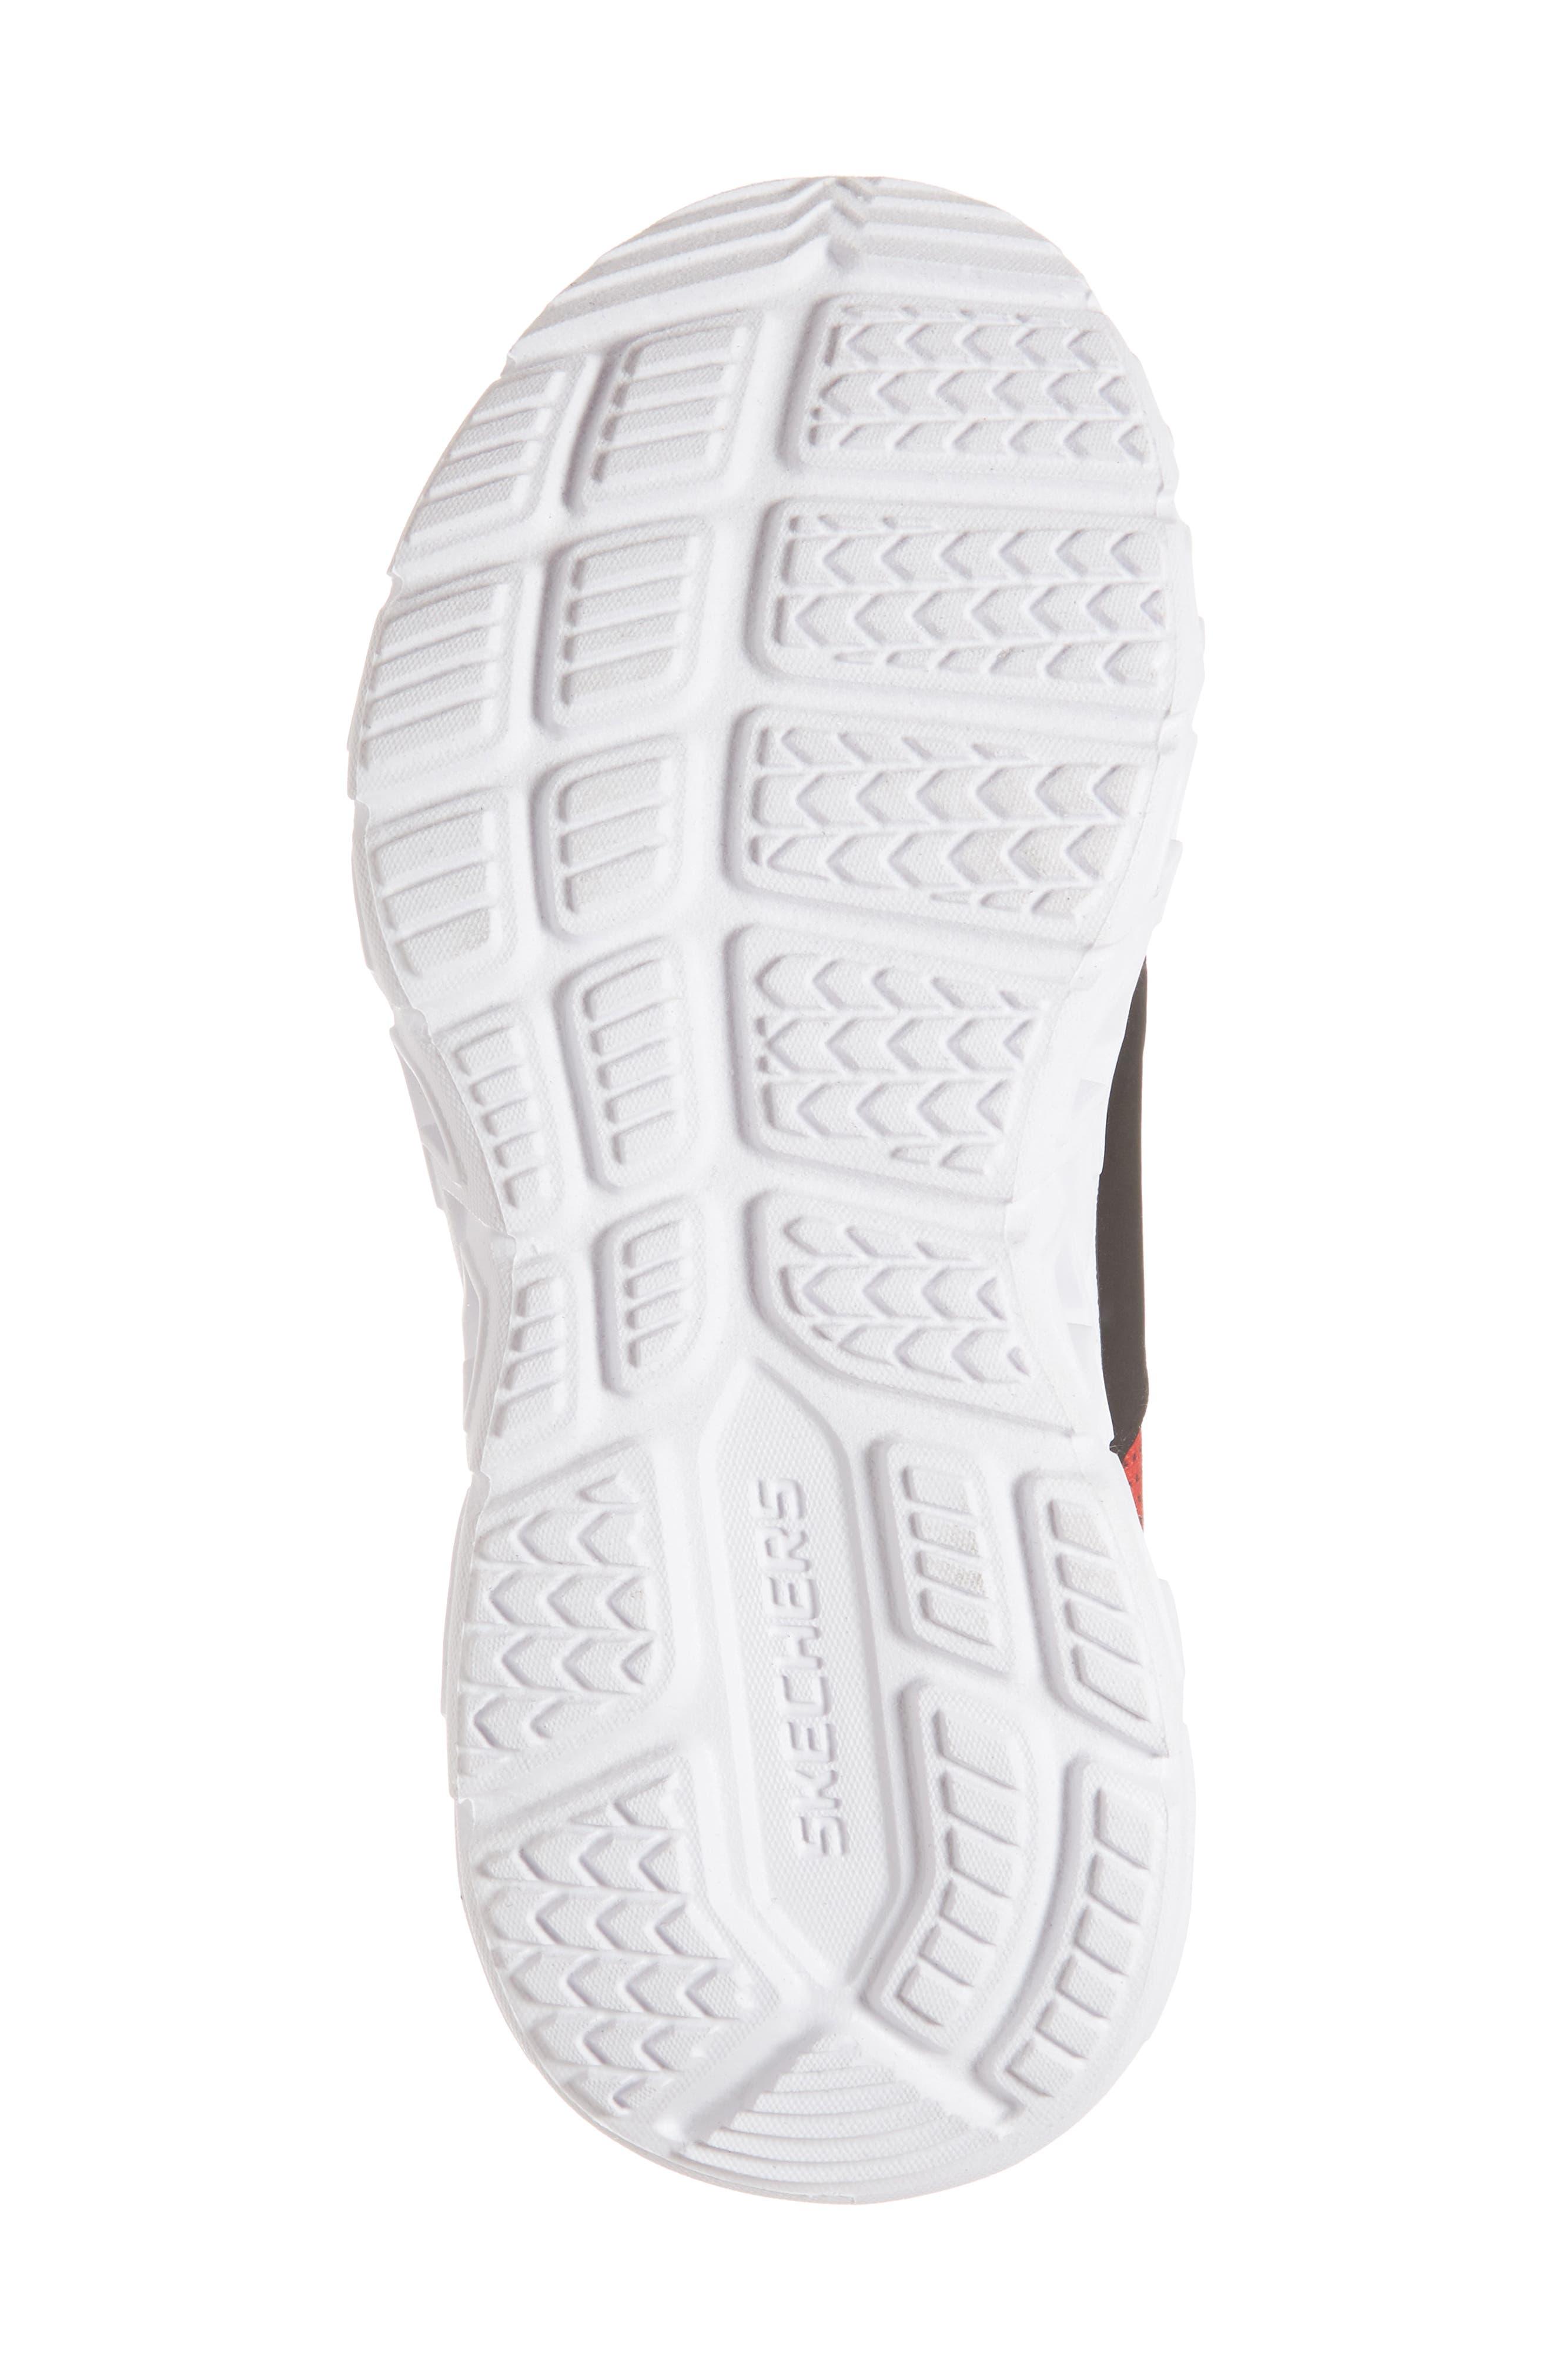 Hypno-Flash 2.0 Rapid Quake Sneakers,                             Alternate thumbnail 6, color,